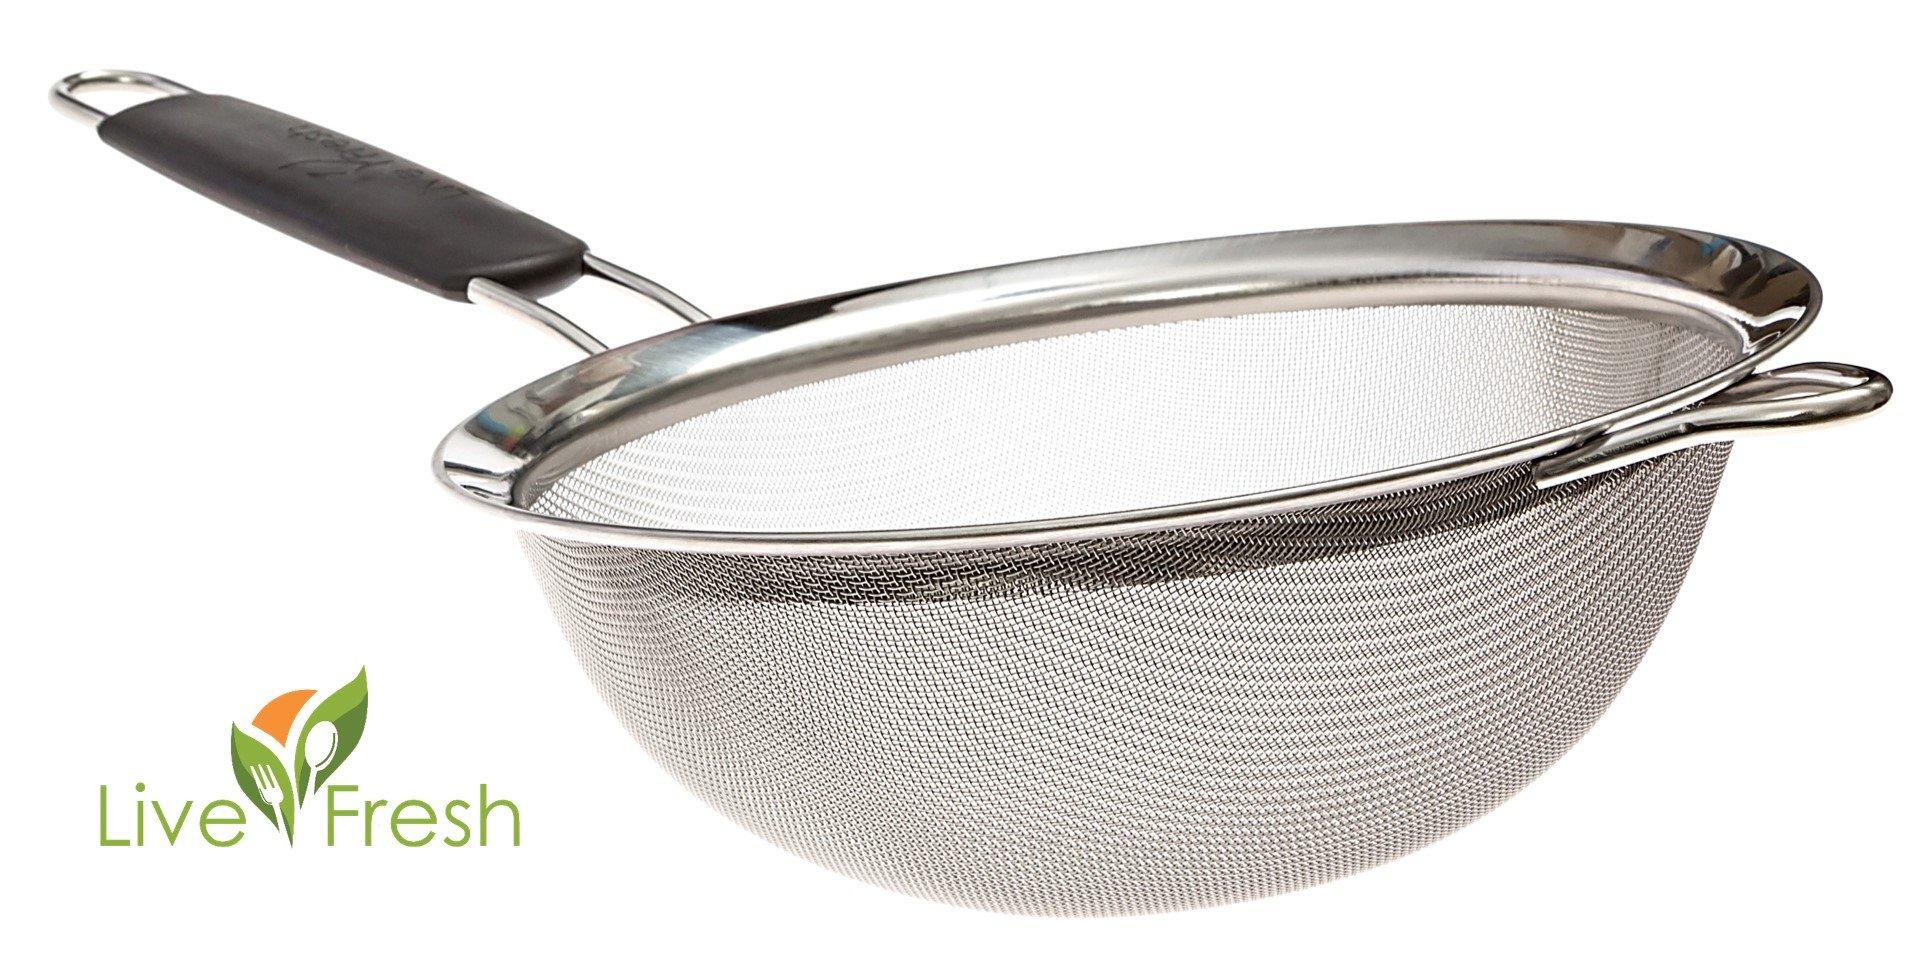 Colador LiveFresh premium con malla fina de acero inoxidable - 19,5 cm - Cuele